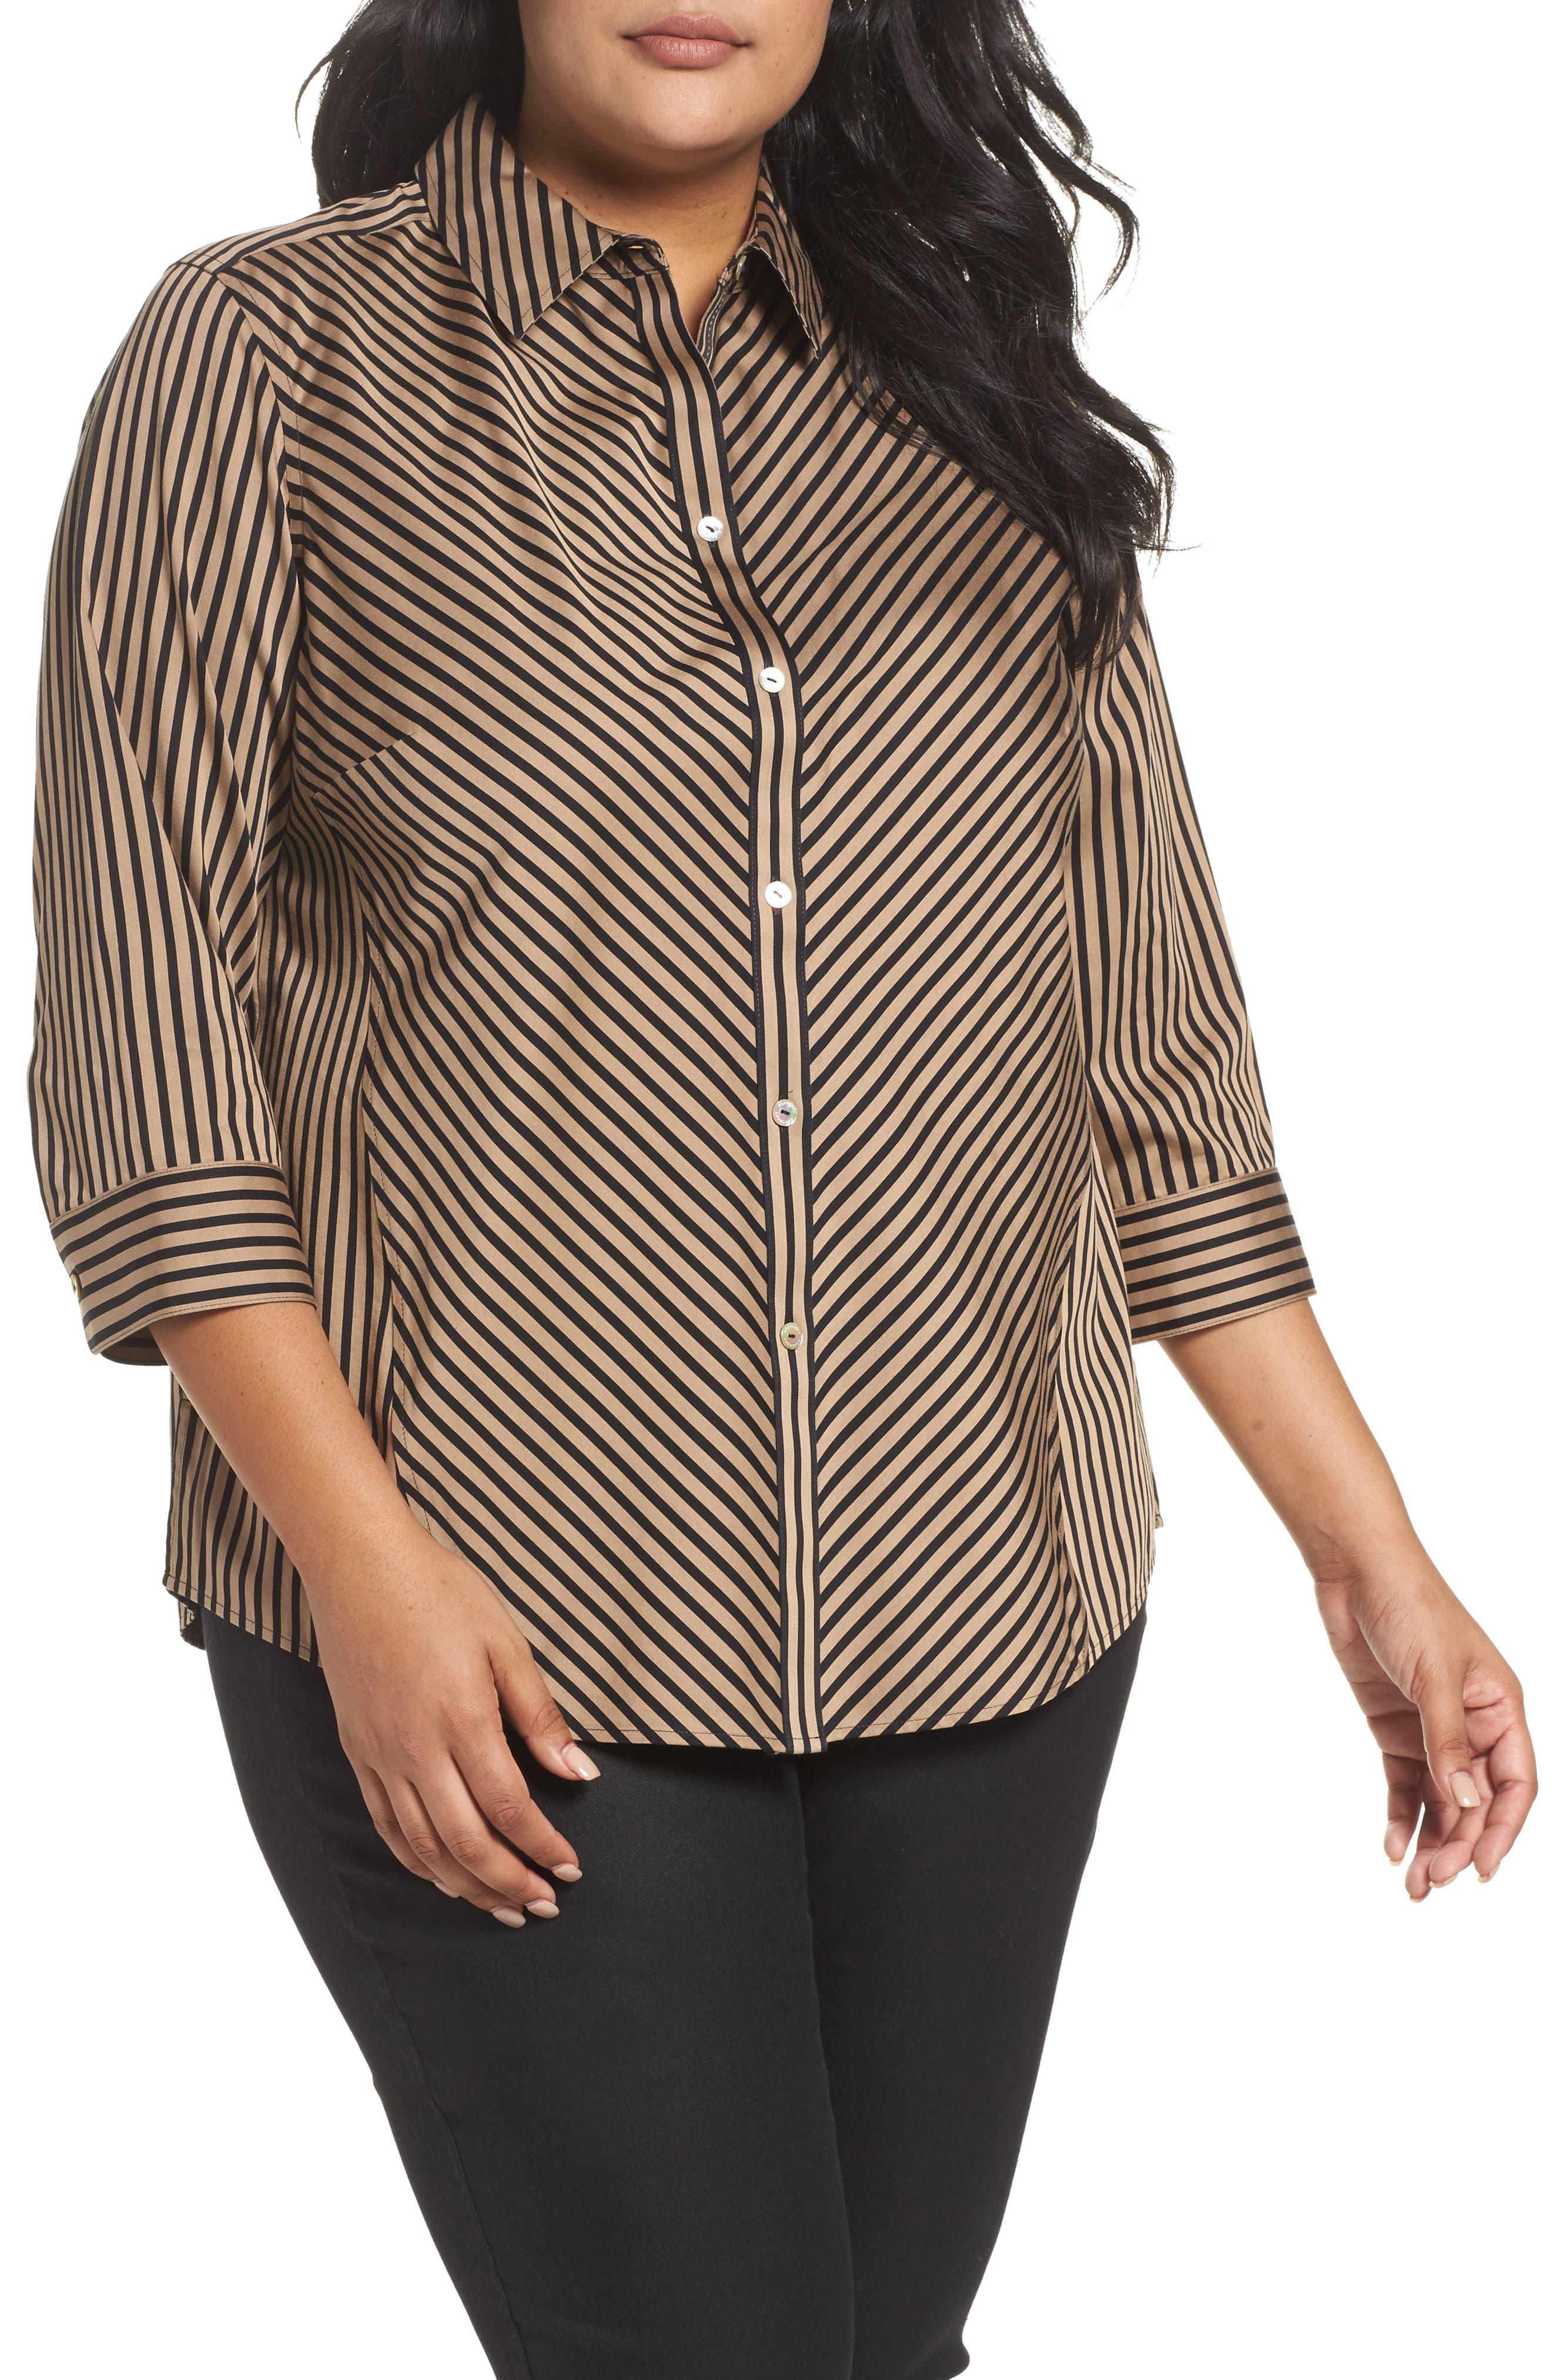 Main Image - Foxcroft Fallon Satin Stripe Cotton Shirt (Plus Size)